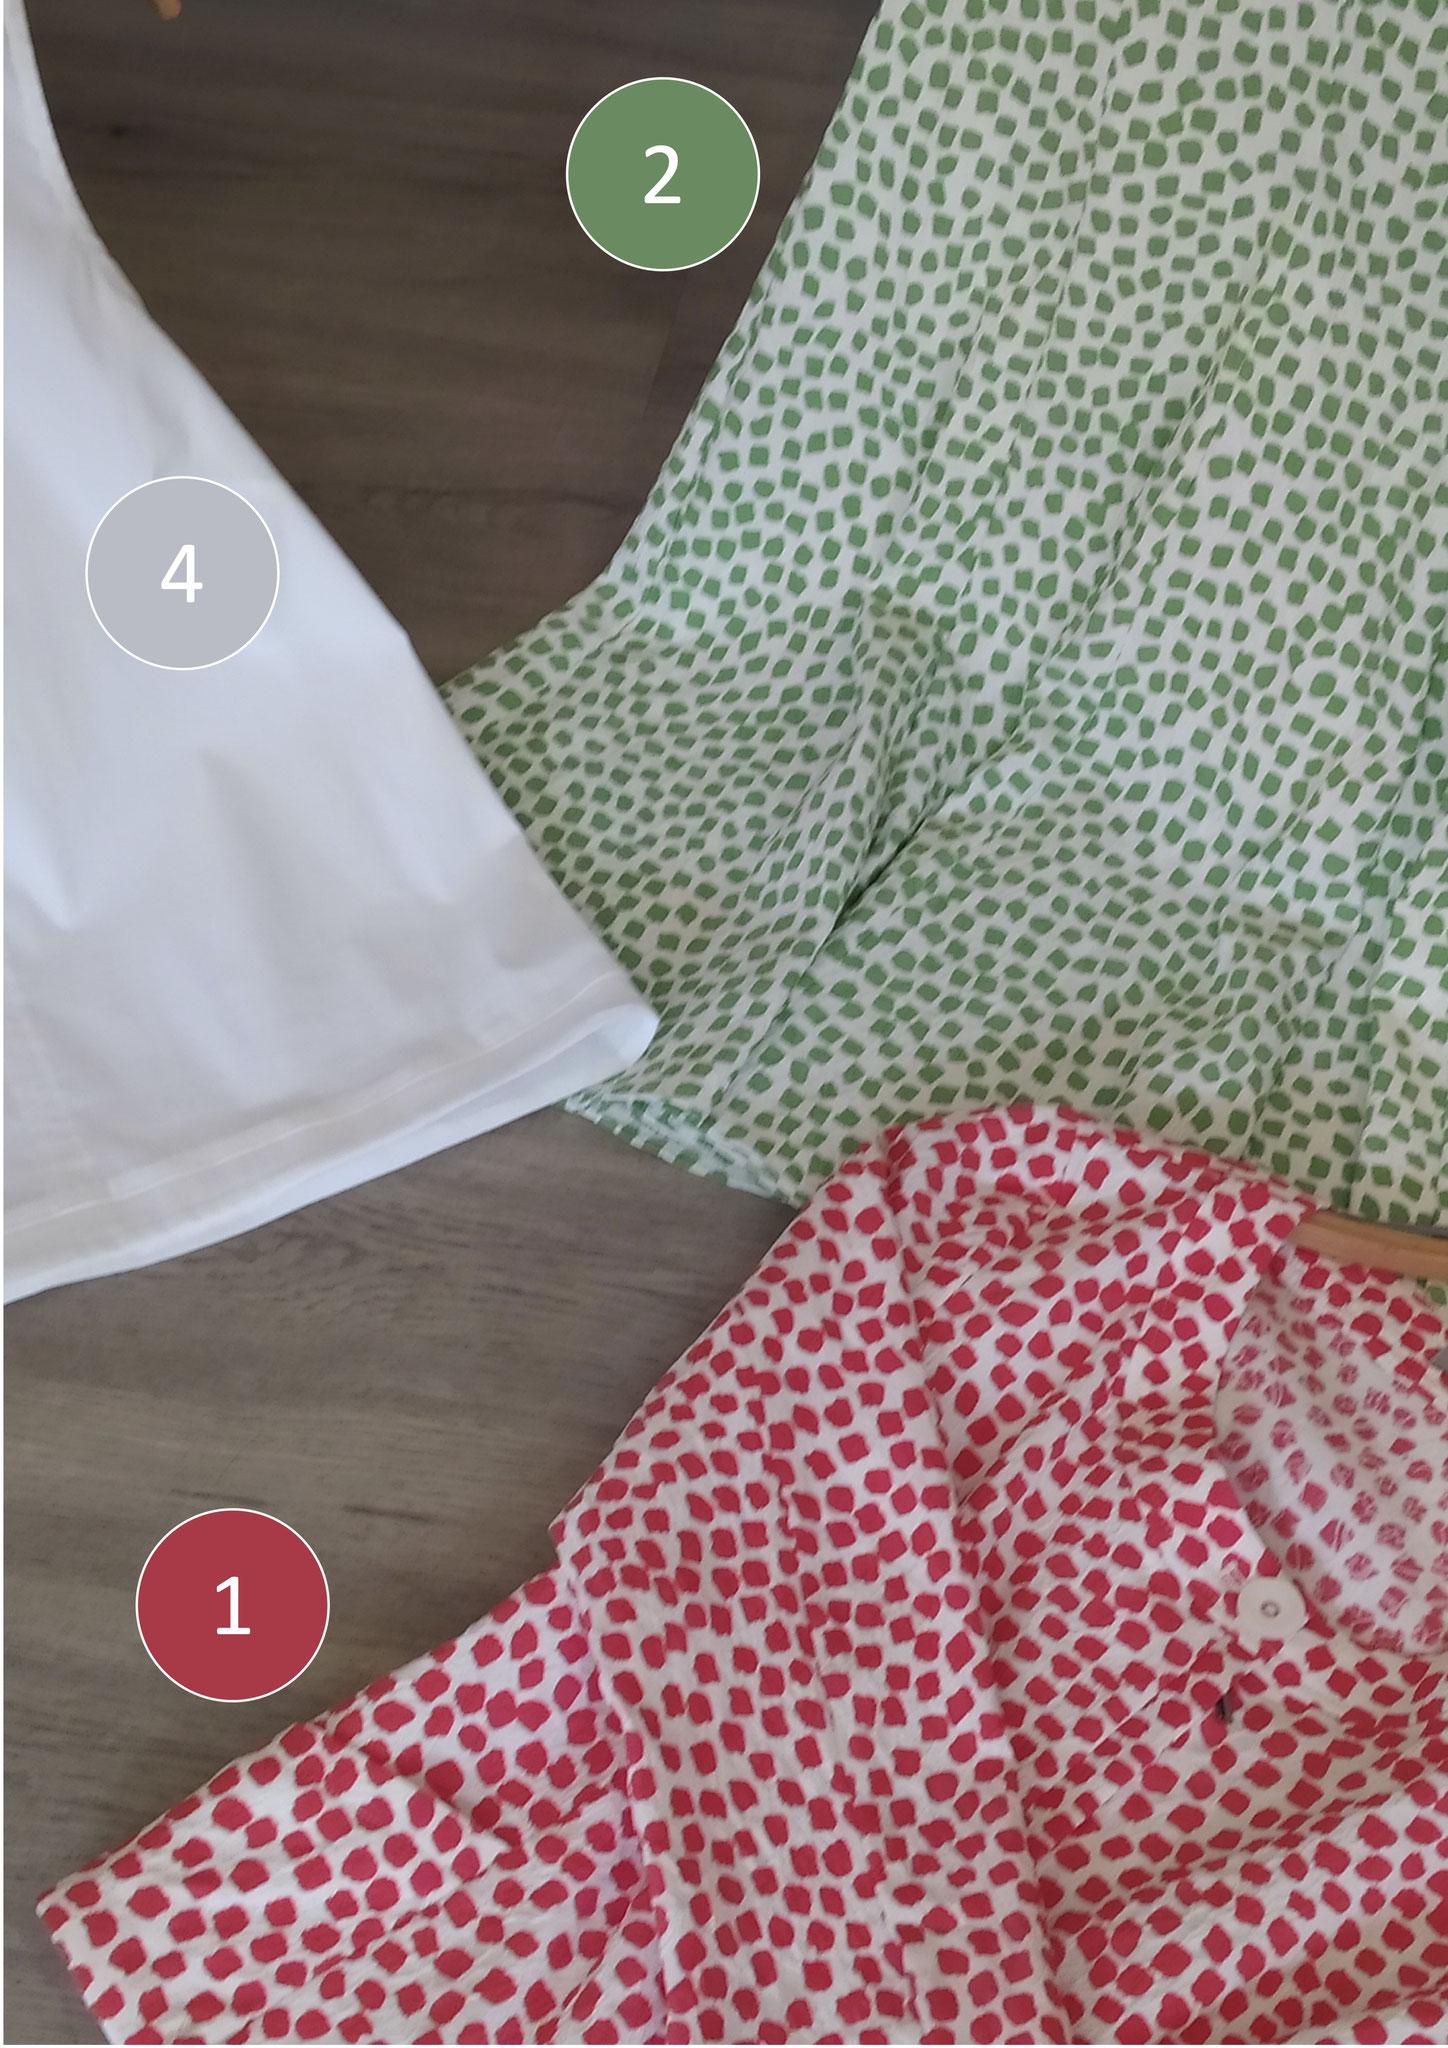 4. Top, Baumwolle (79 €), 2. Druckkleid (129 €), 1. Druckjacke, kurz, rot (119 €)